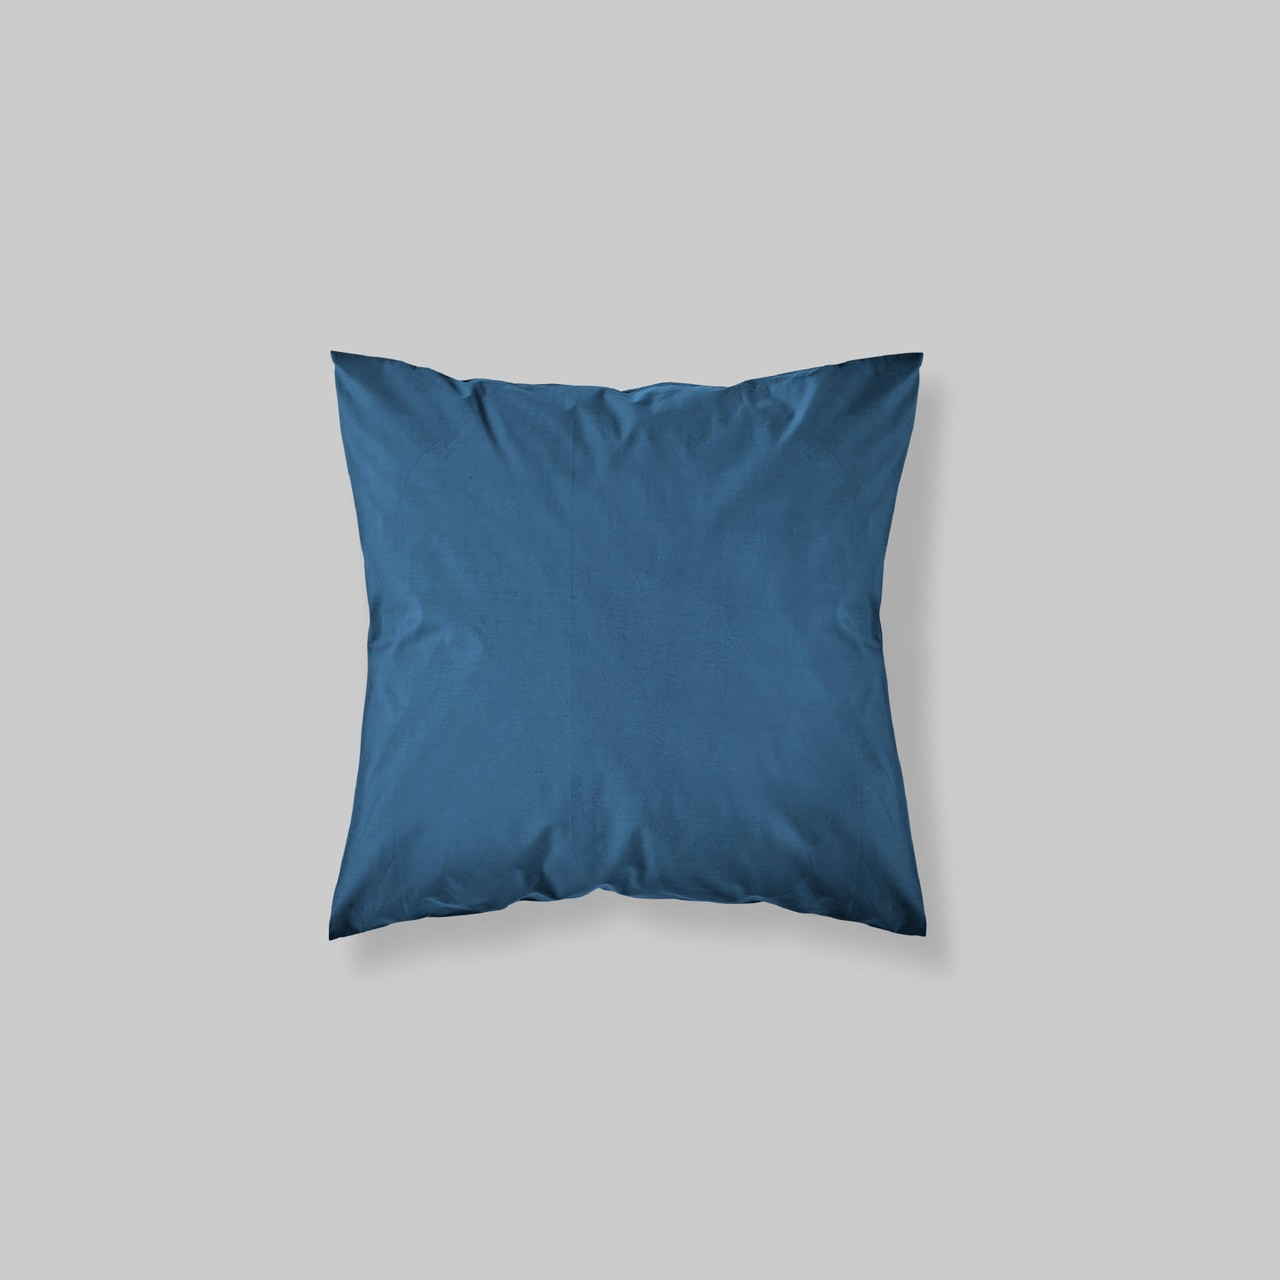 Euro Sham Pair Solid Color Navy Blue Tfg Tessitura